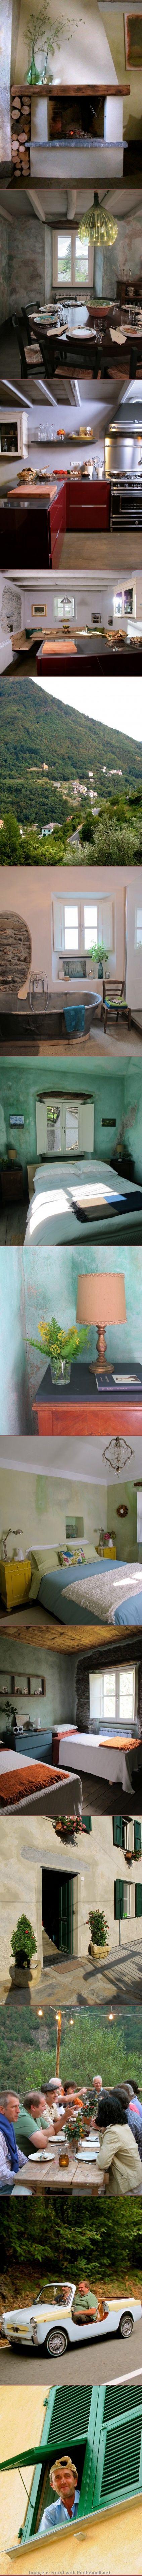 The Brian Boitano Project on HGTV. Brian buys and renovates his Italian family home.